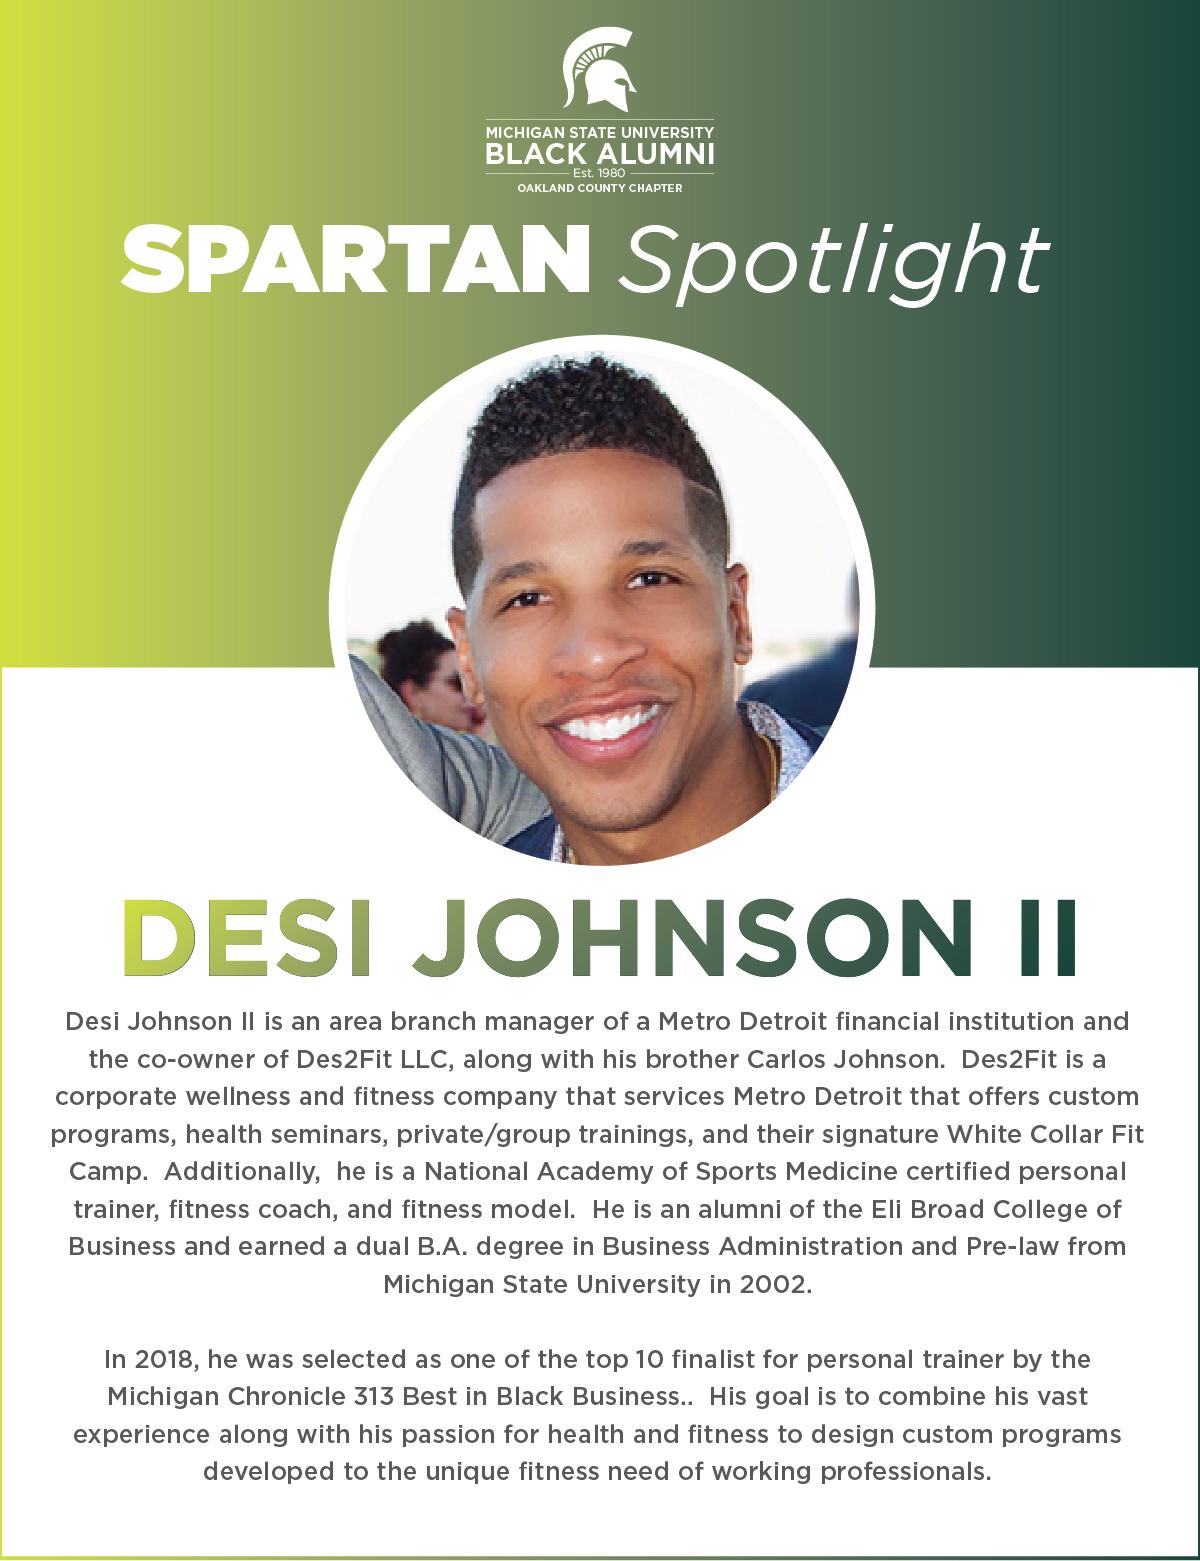 MSUBAOC Spartan Spotlight Desi Johnson I